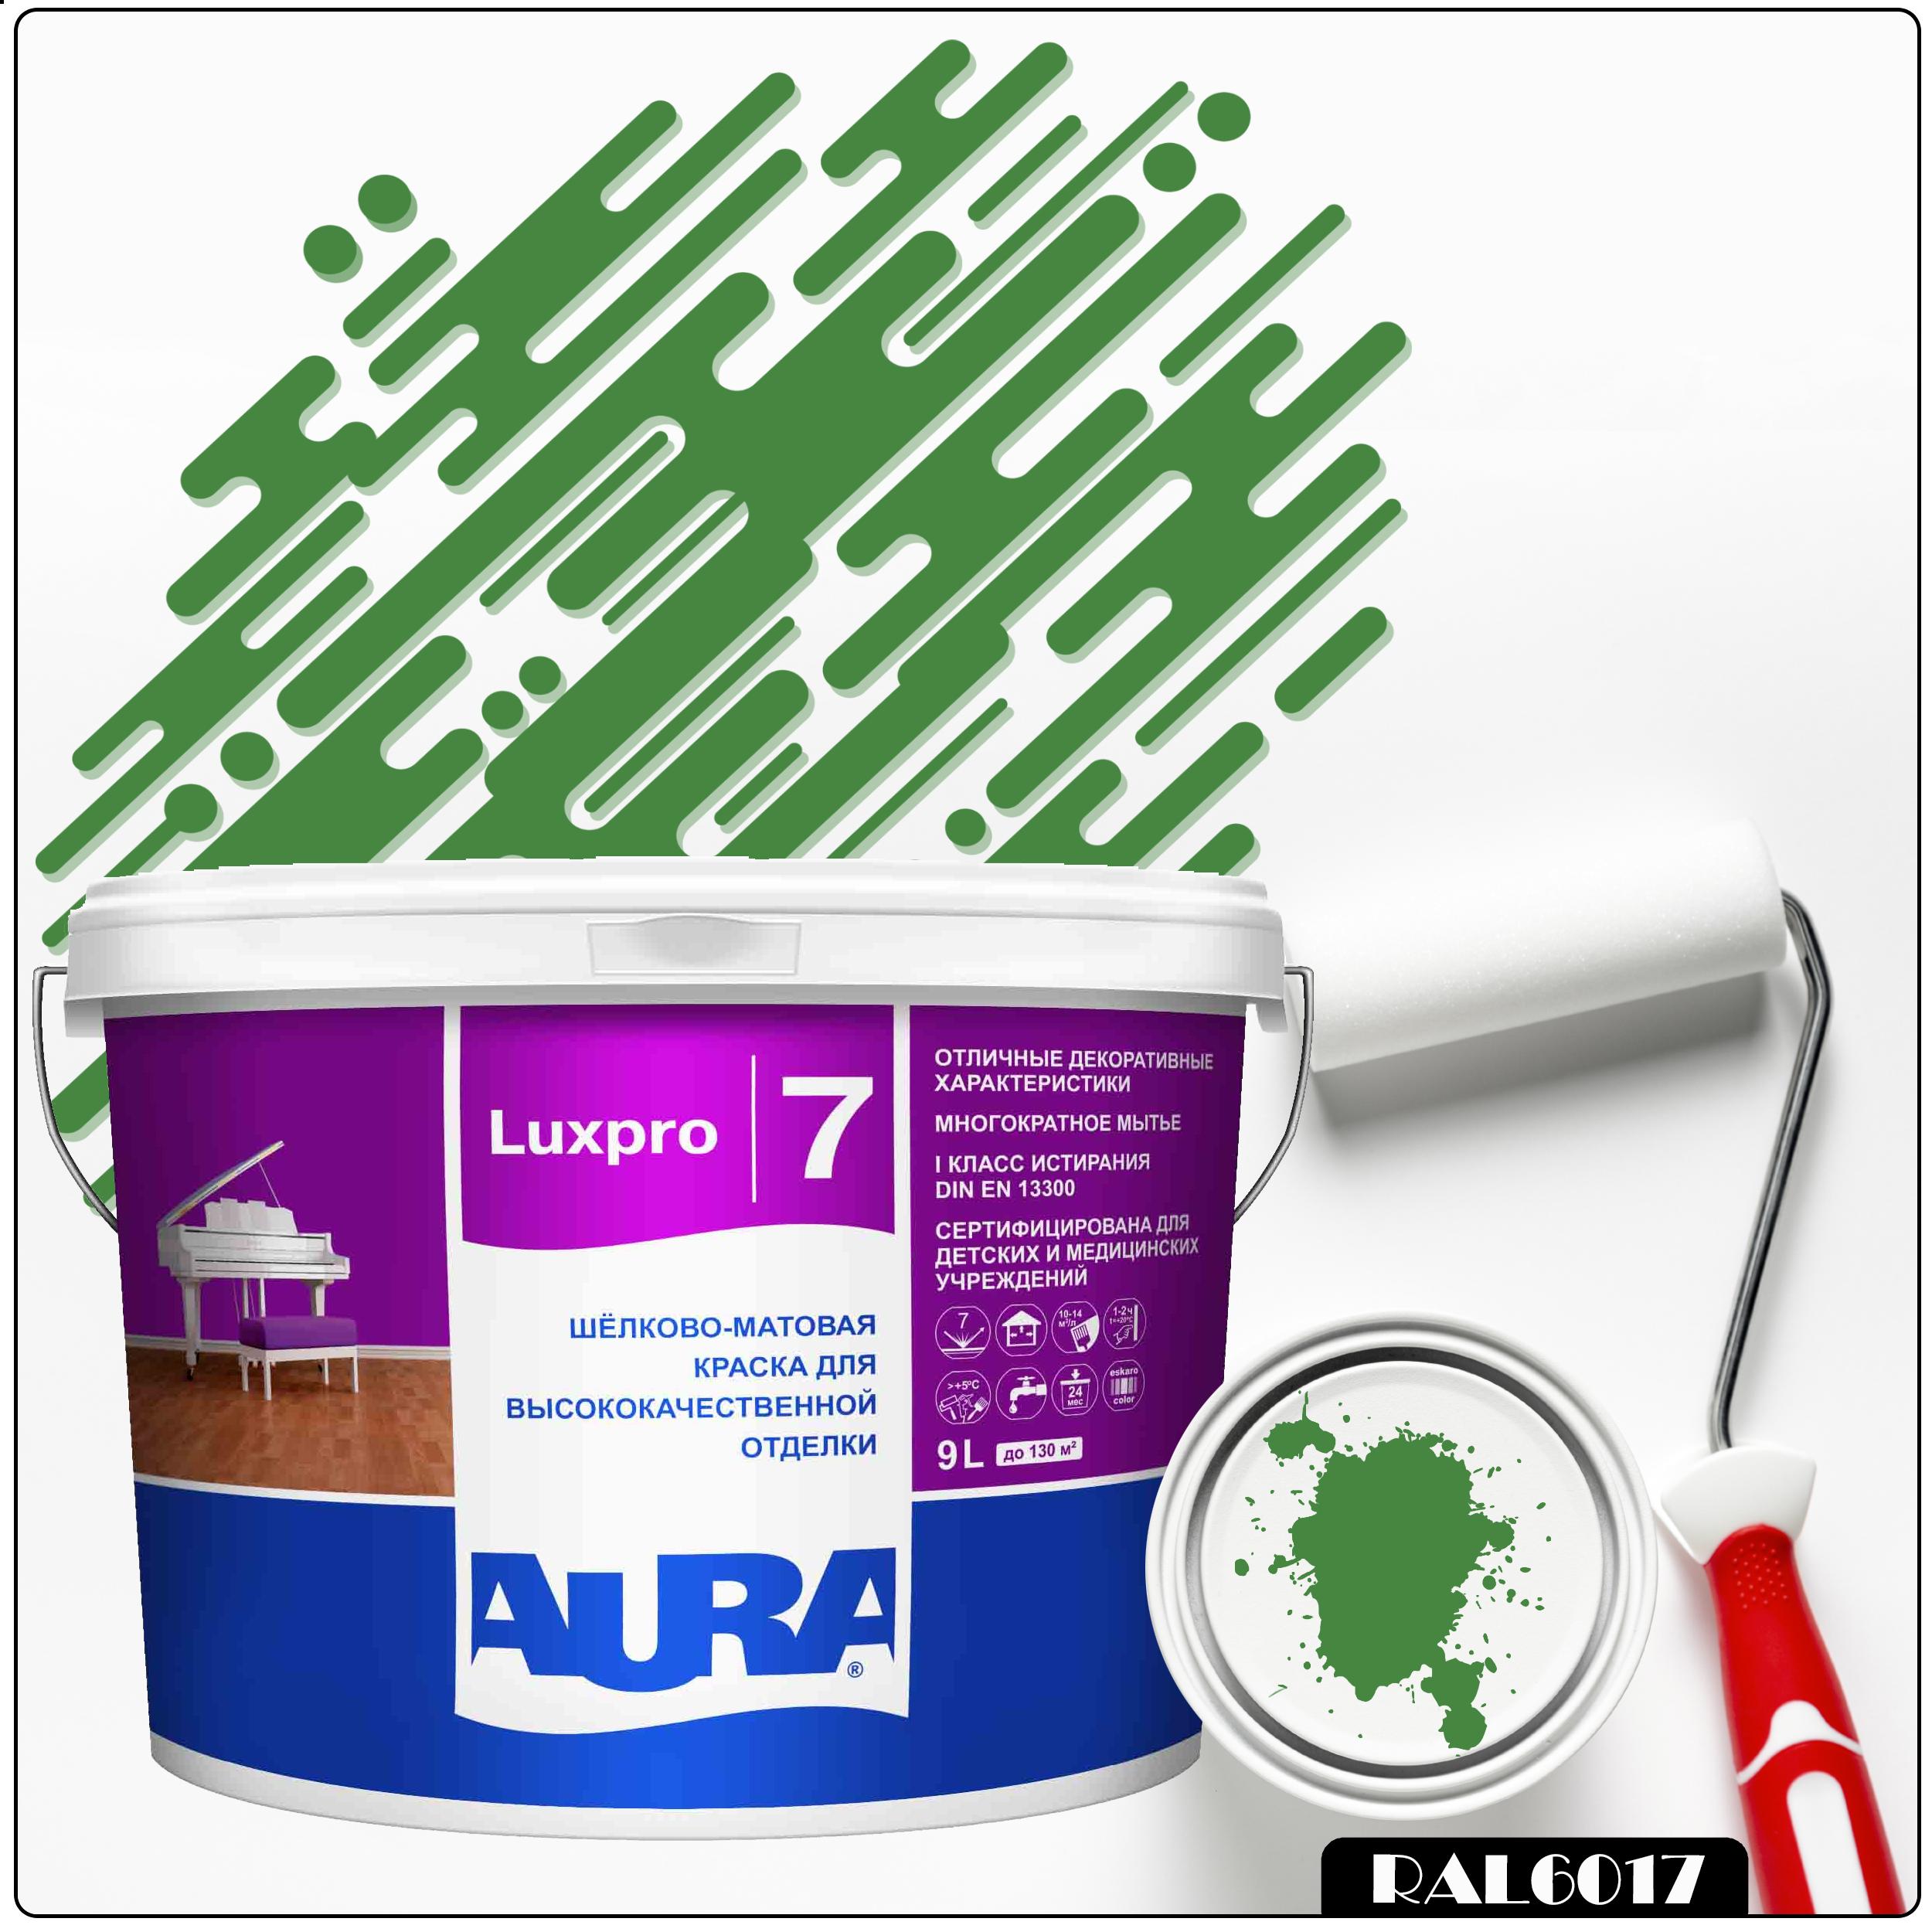 Фото 18 - Краска Aura LuxPRO 7, RAL 6017 Майская зелень, латексная, шелково-матовая, интерьерная, 9л, Аура.